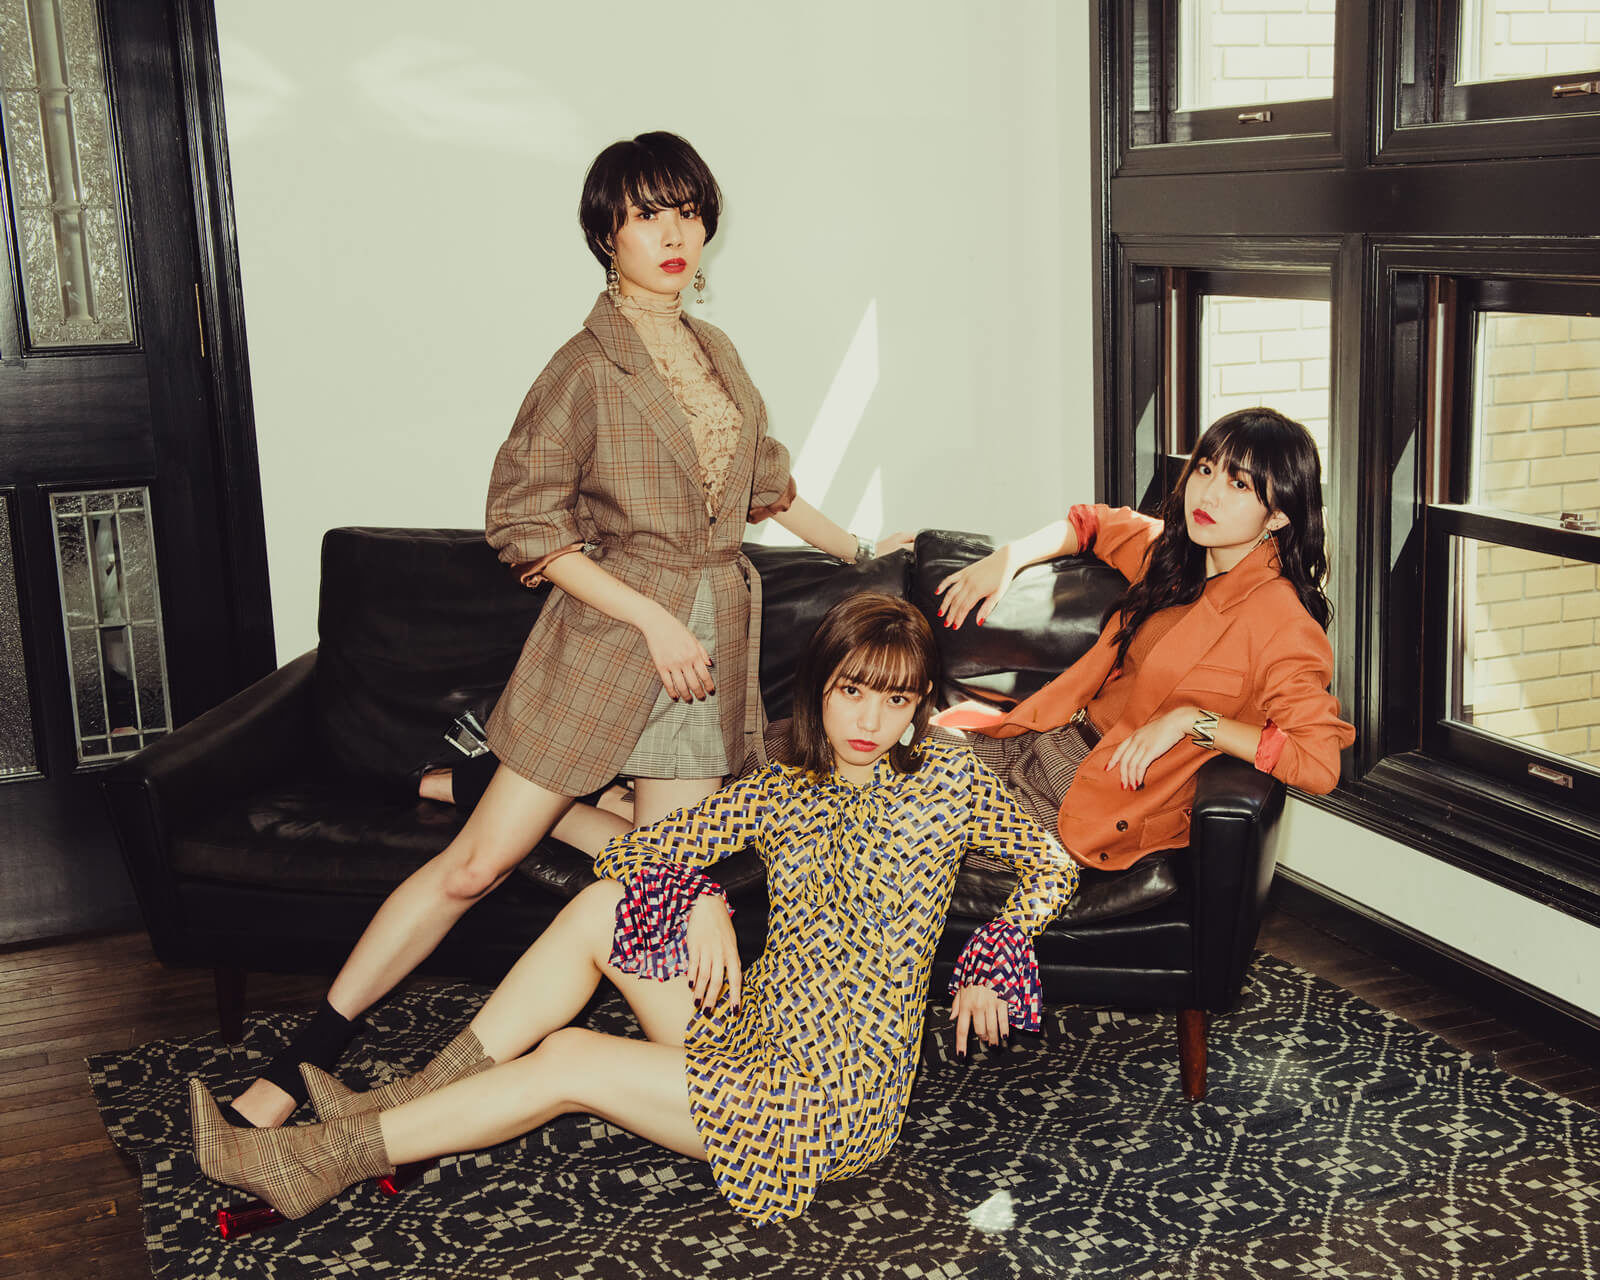 kolme、アルバム解説&初のスタジオ生歌唱をLINE LIVEにて生配信決定サムネイル画像